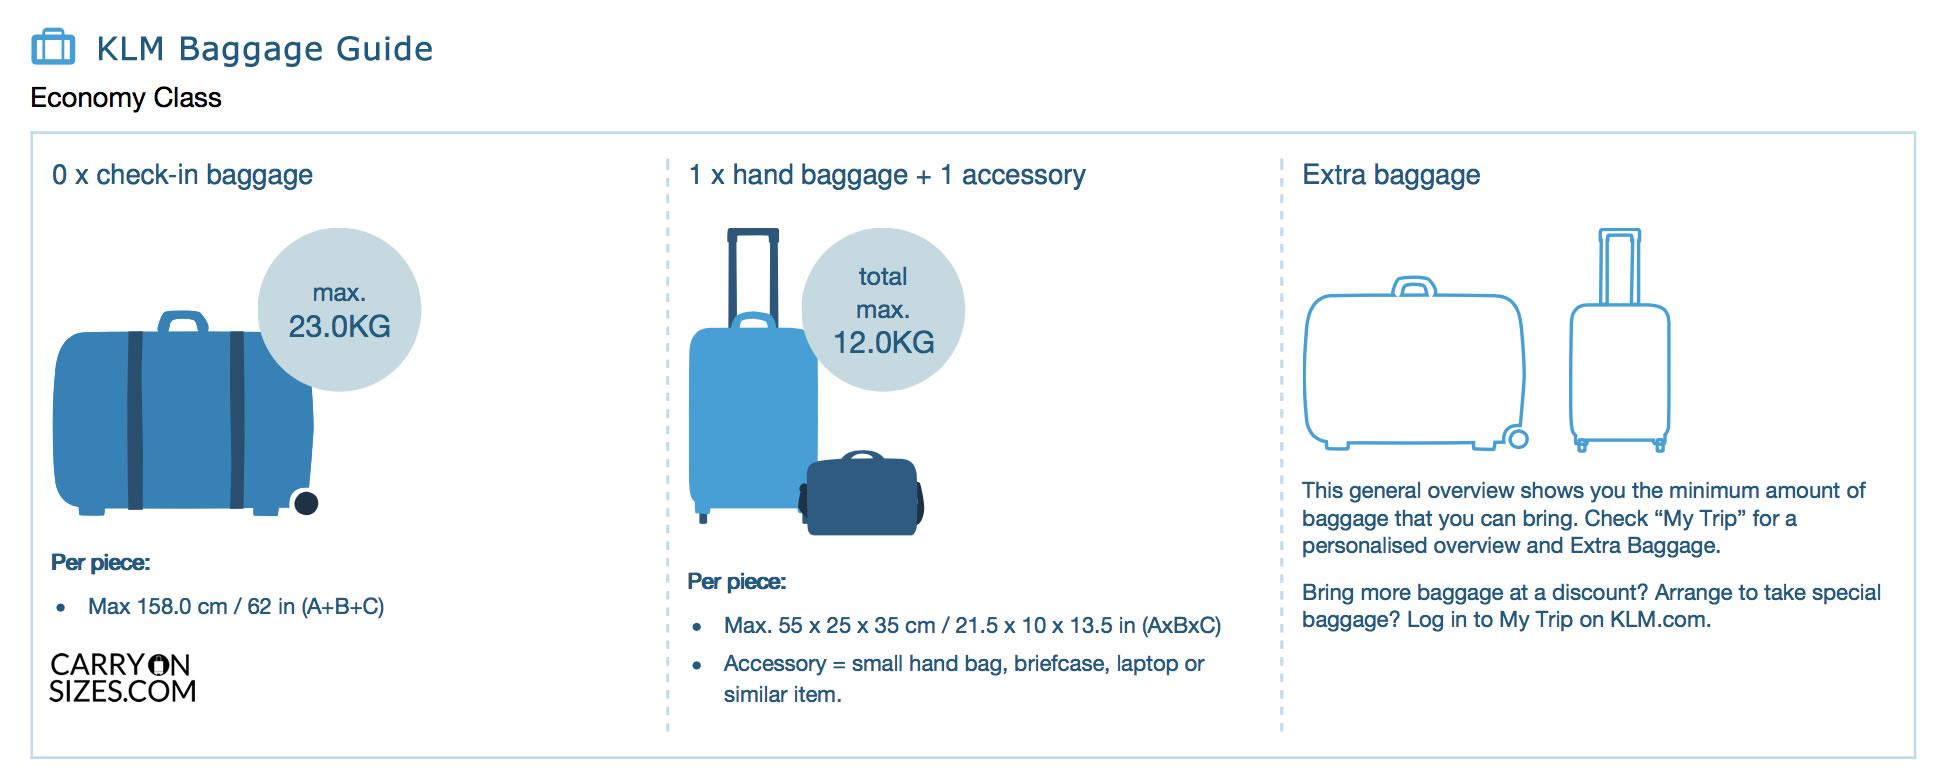 KLM-Baggage-Guide